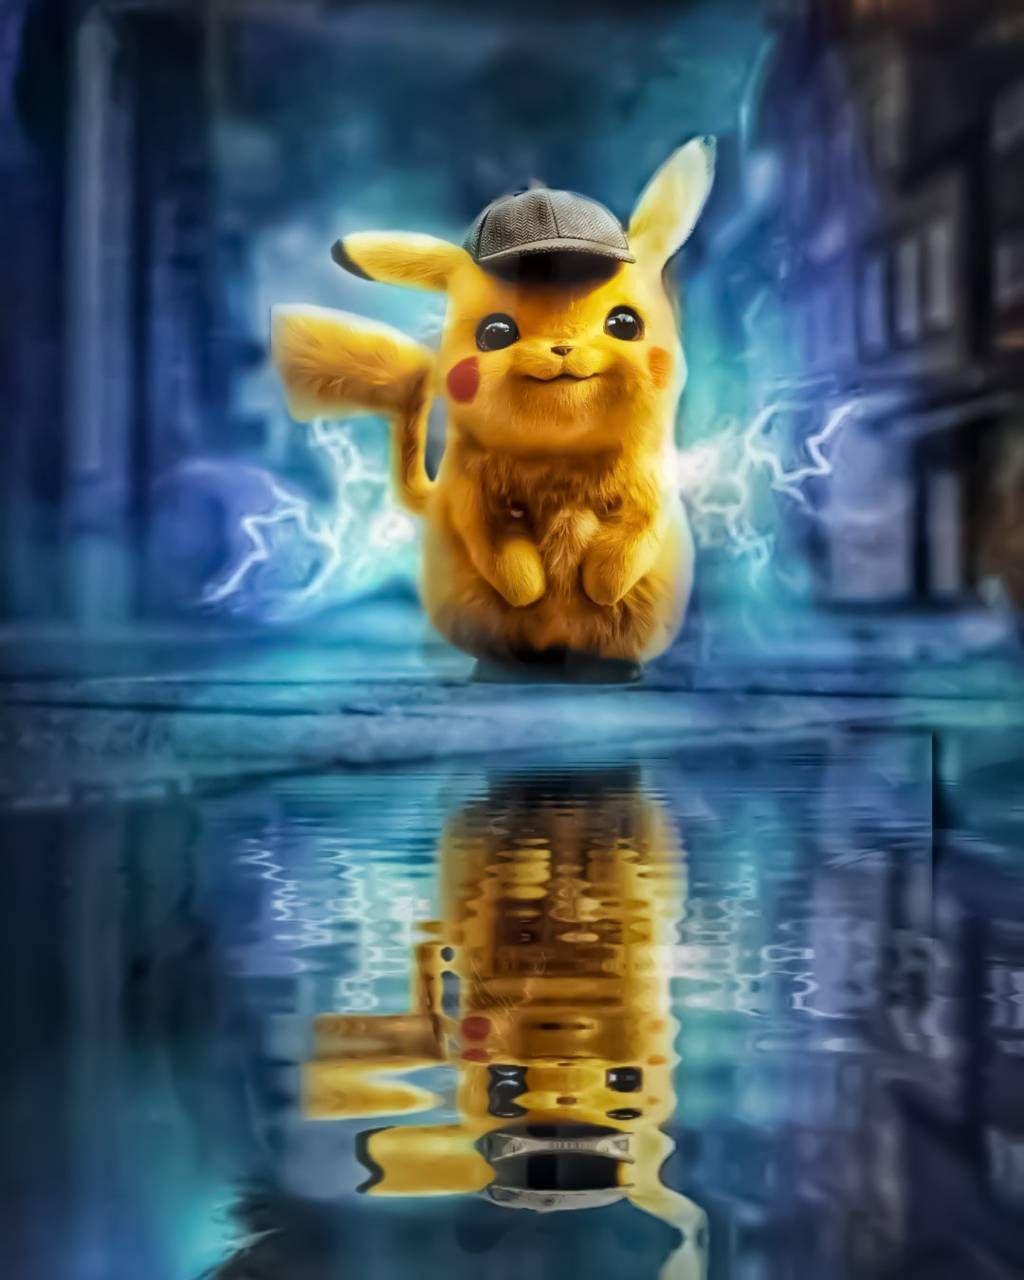 Pikachu Pikachu Wallpaper Pikachu Wallpaper Iphone Pikachu Art